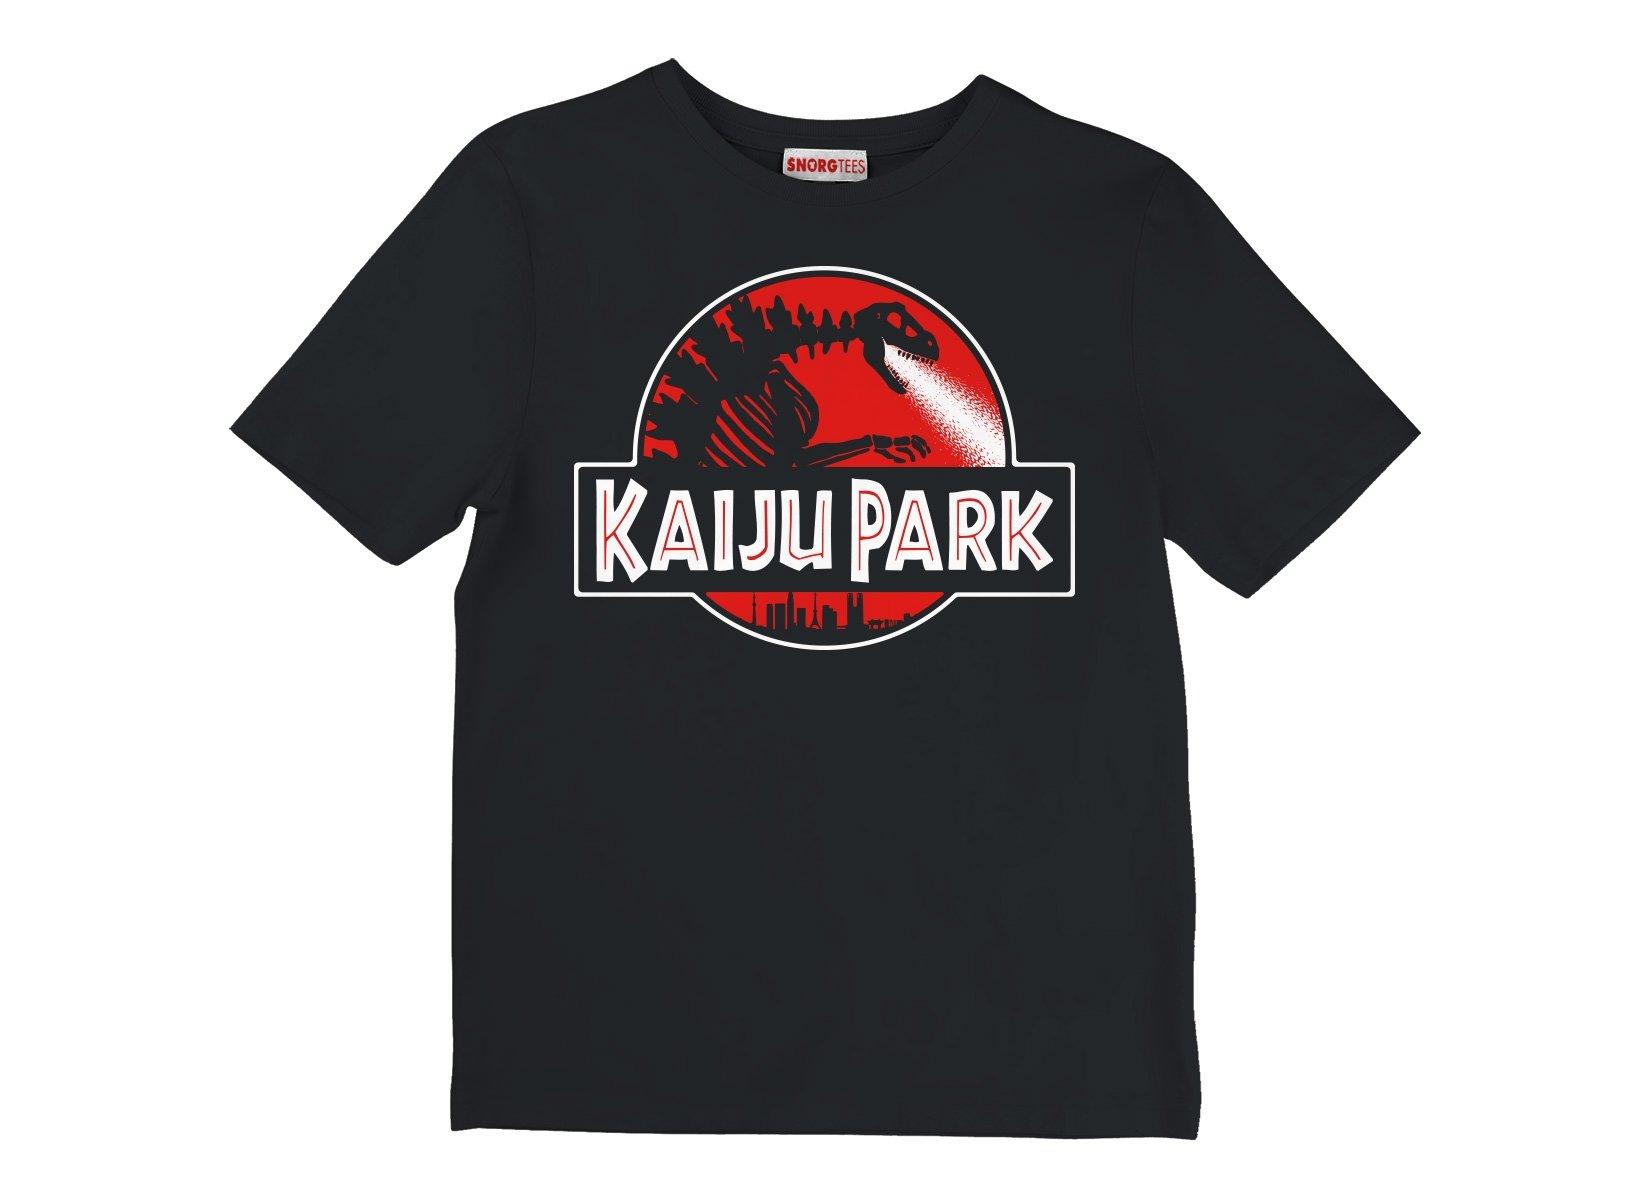 Kaiju Park on Kids T-Shirt